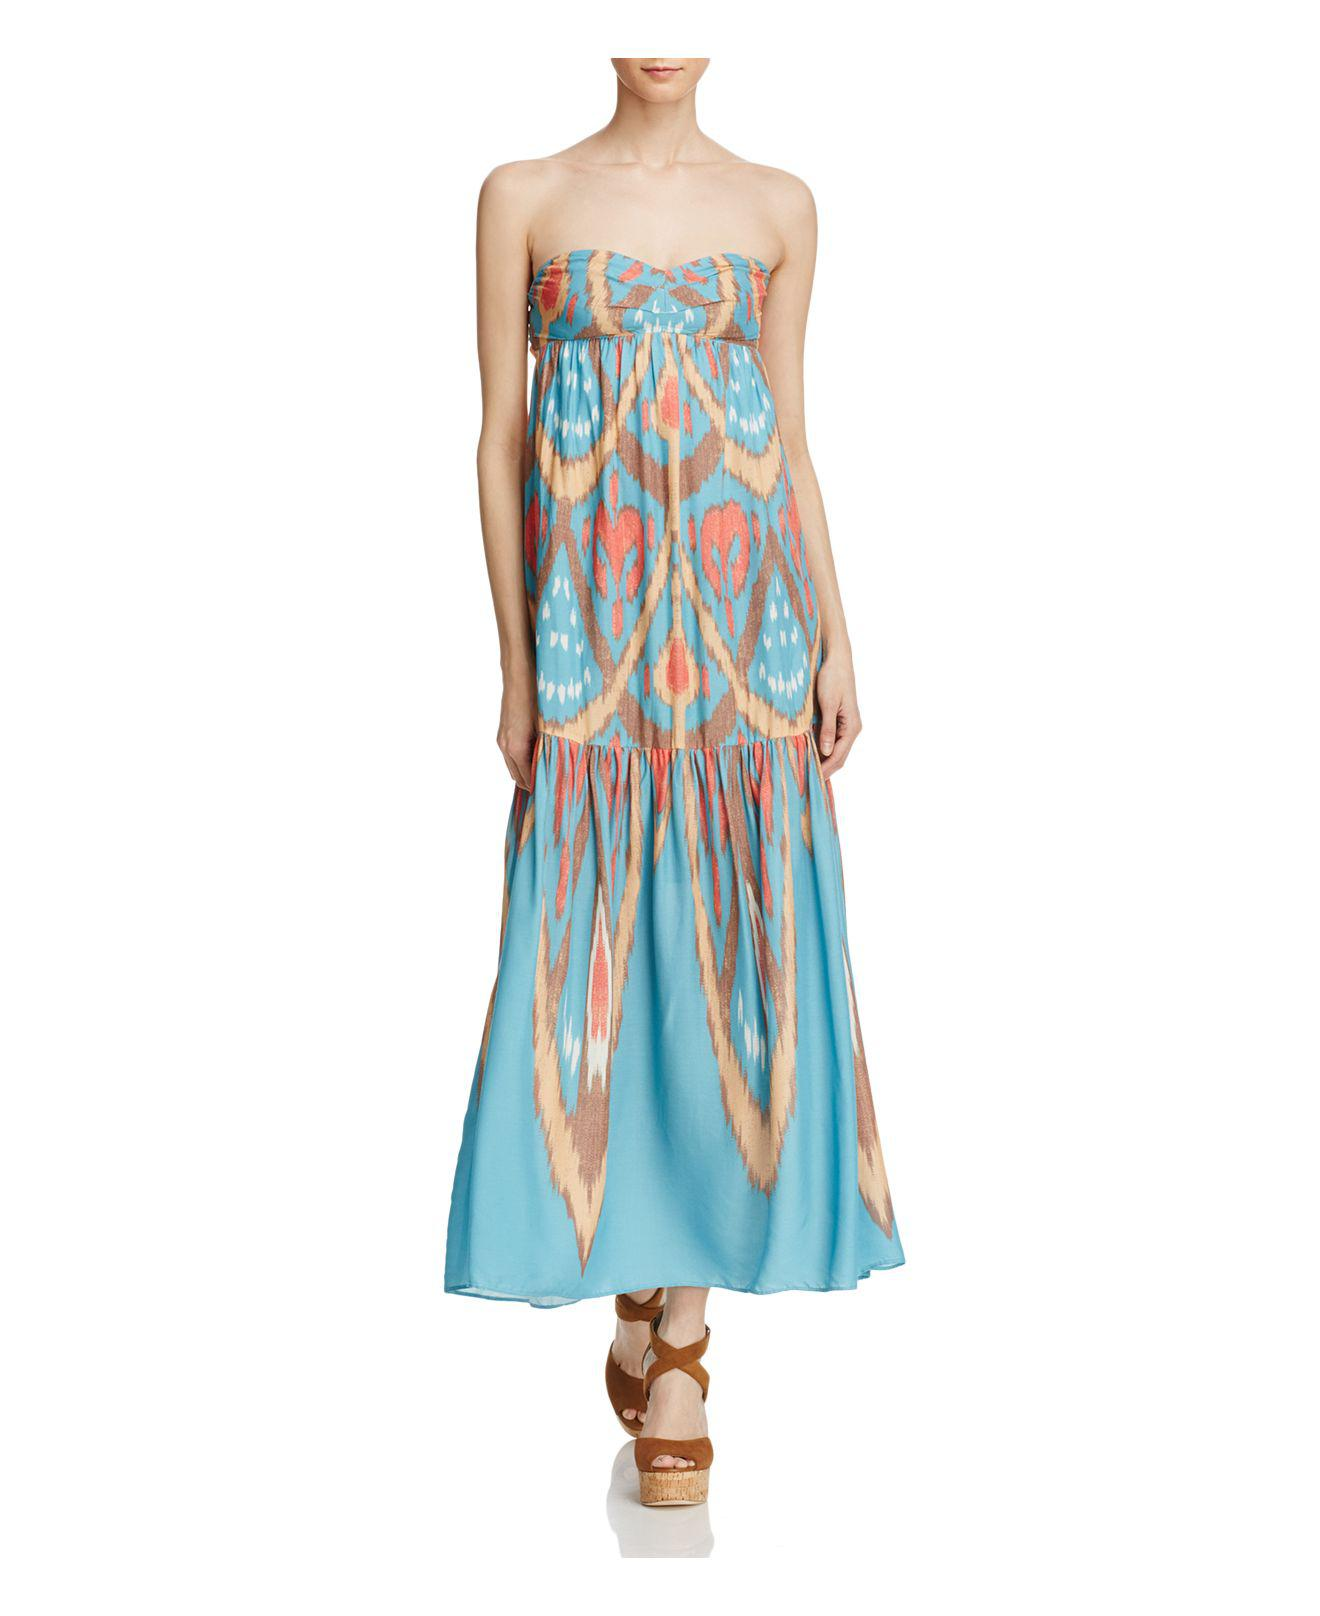 c5bd1ca990d Lyst - Free People Mojave Maxi Dress in Blue